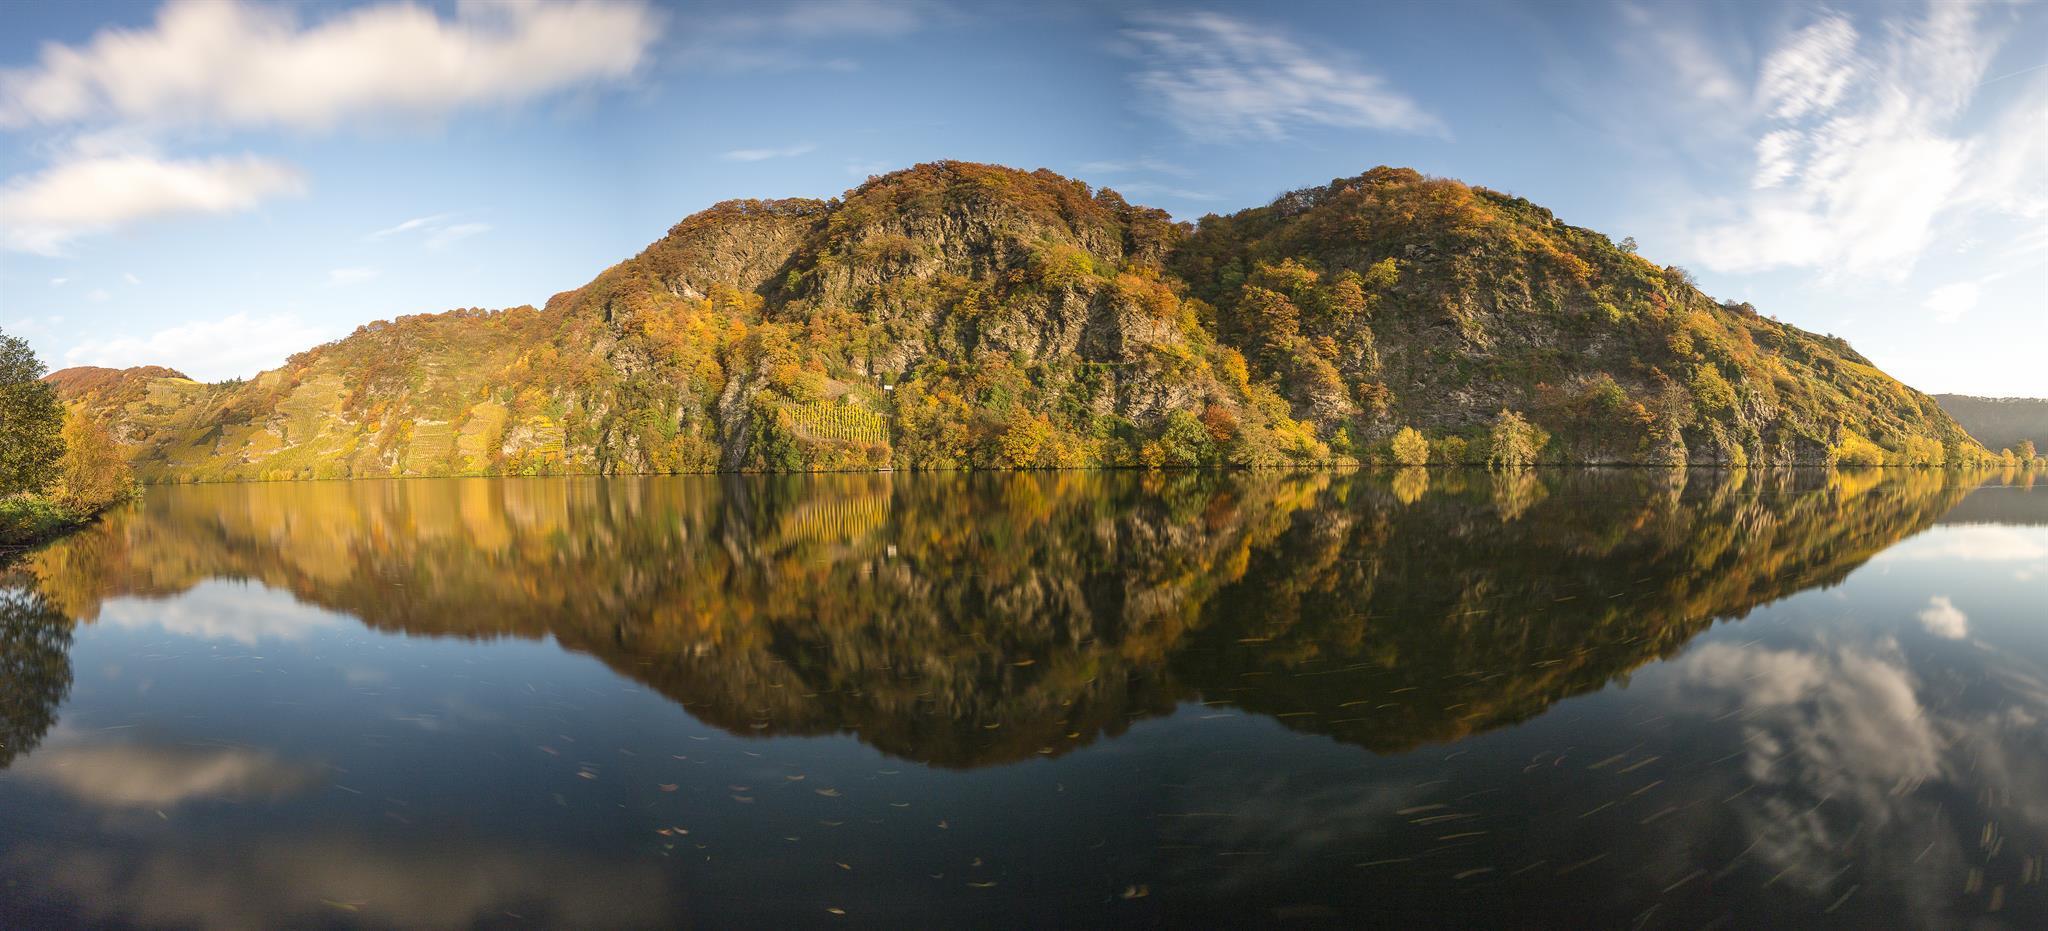 Moselloreley im Herbst